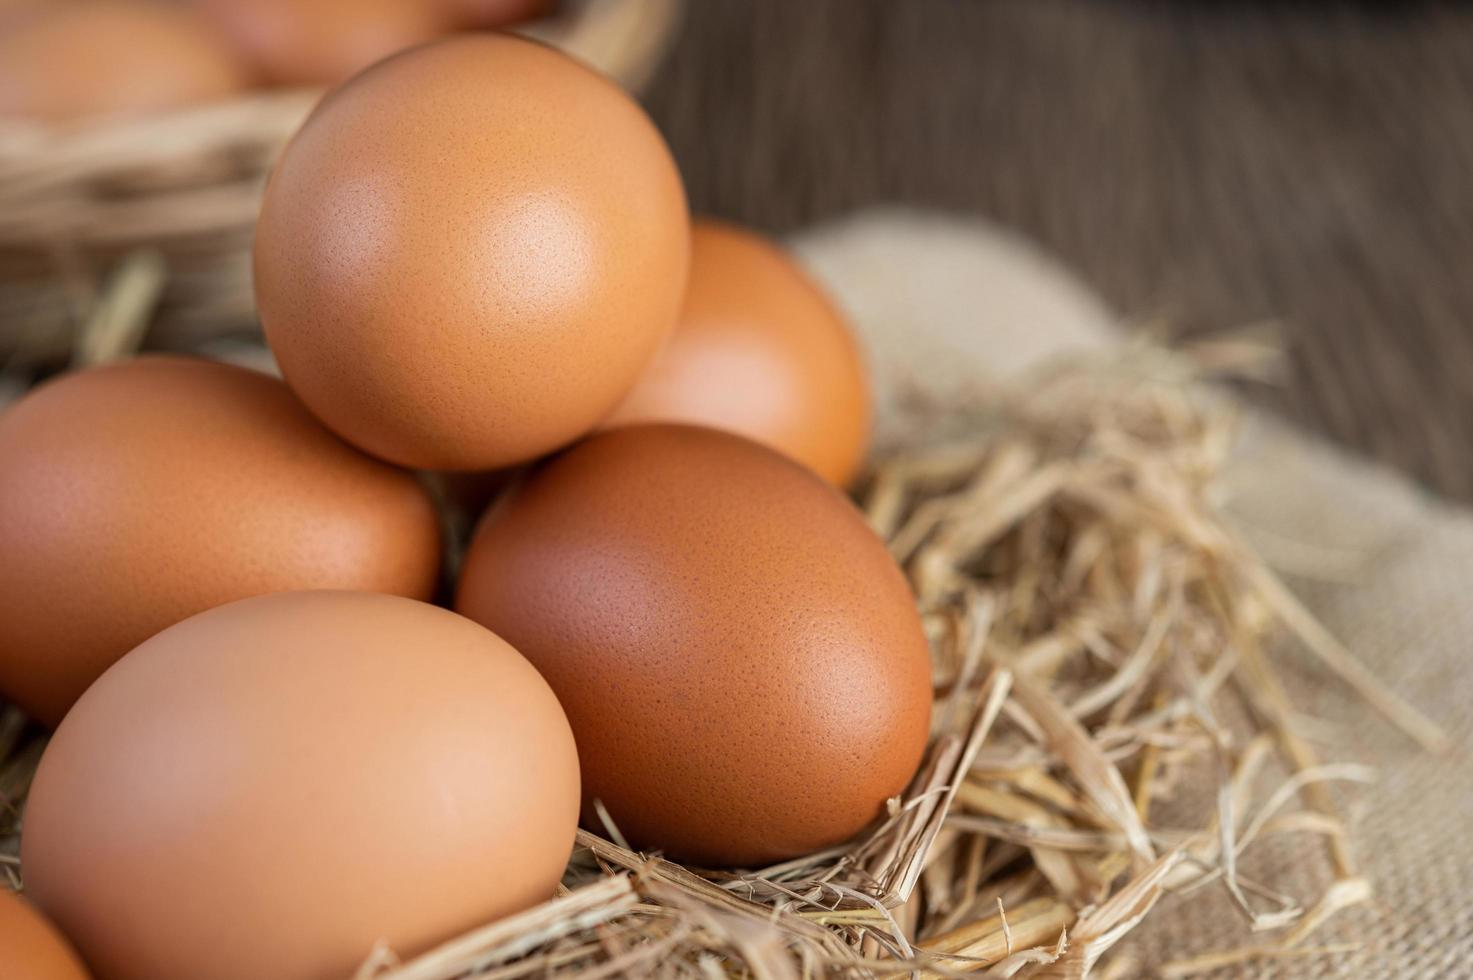 Raw eggs on hemp and straw photo